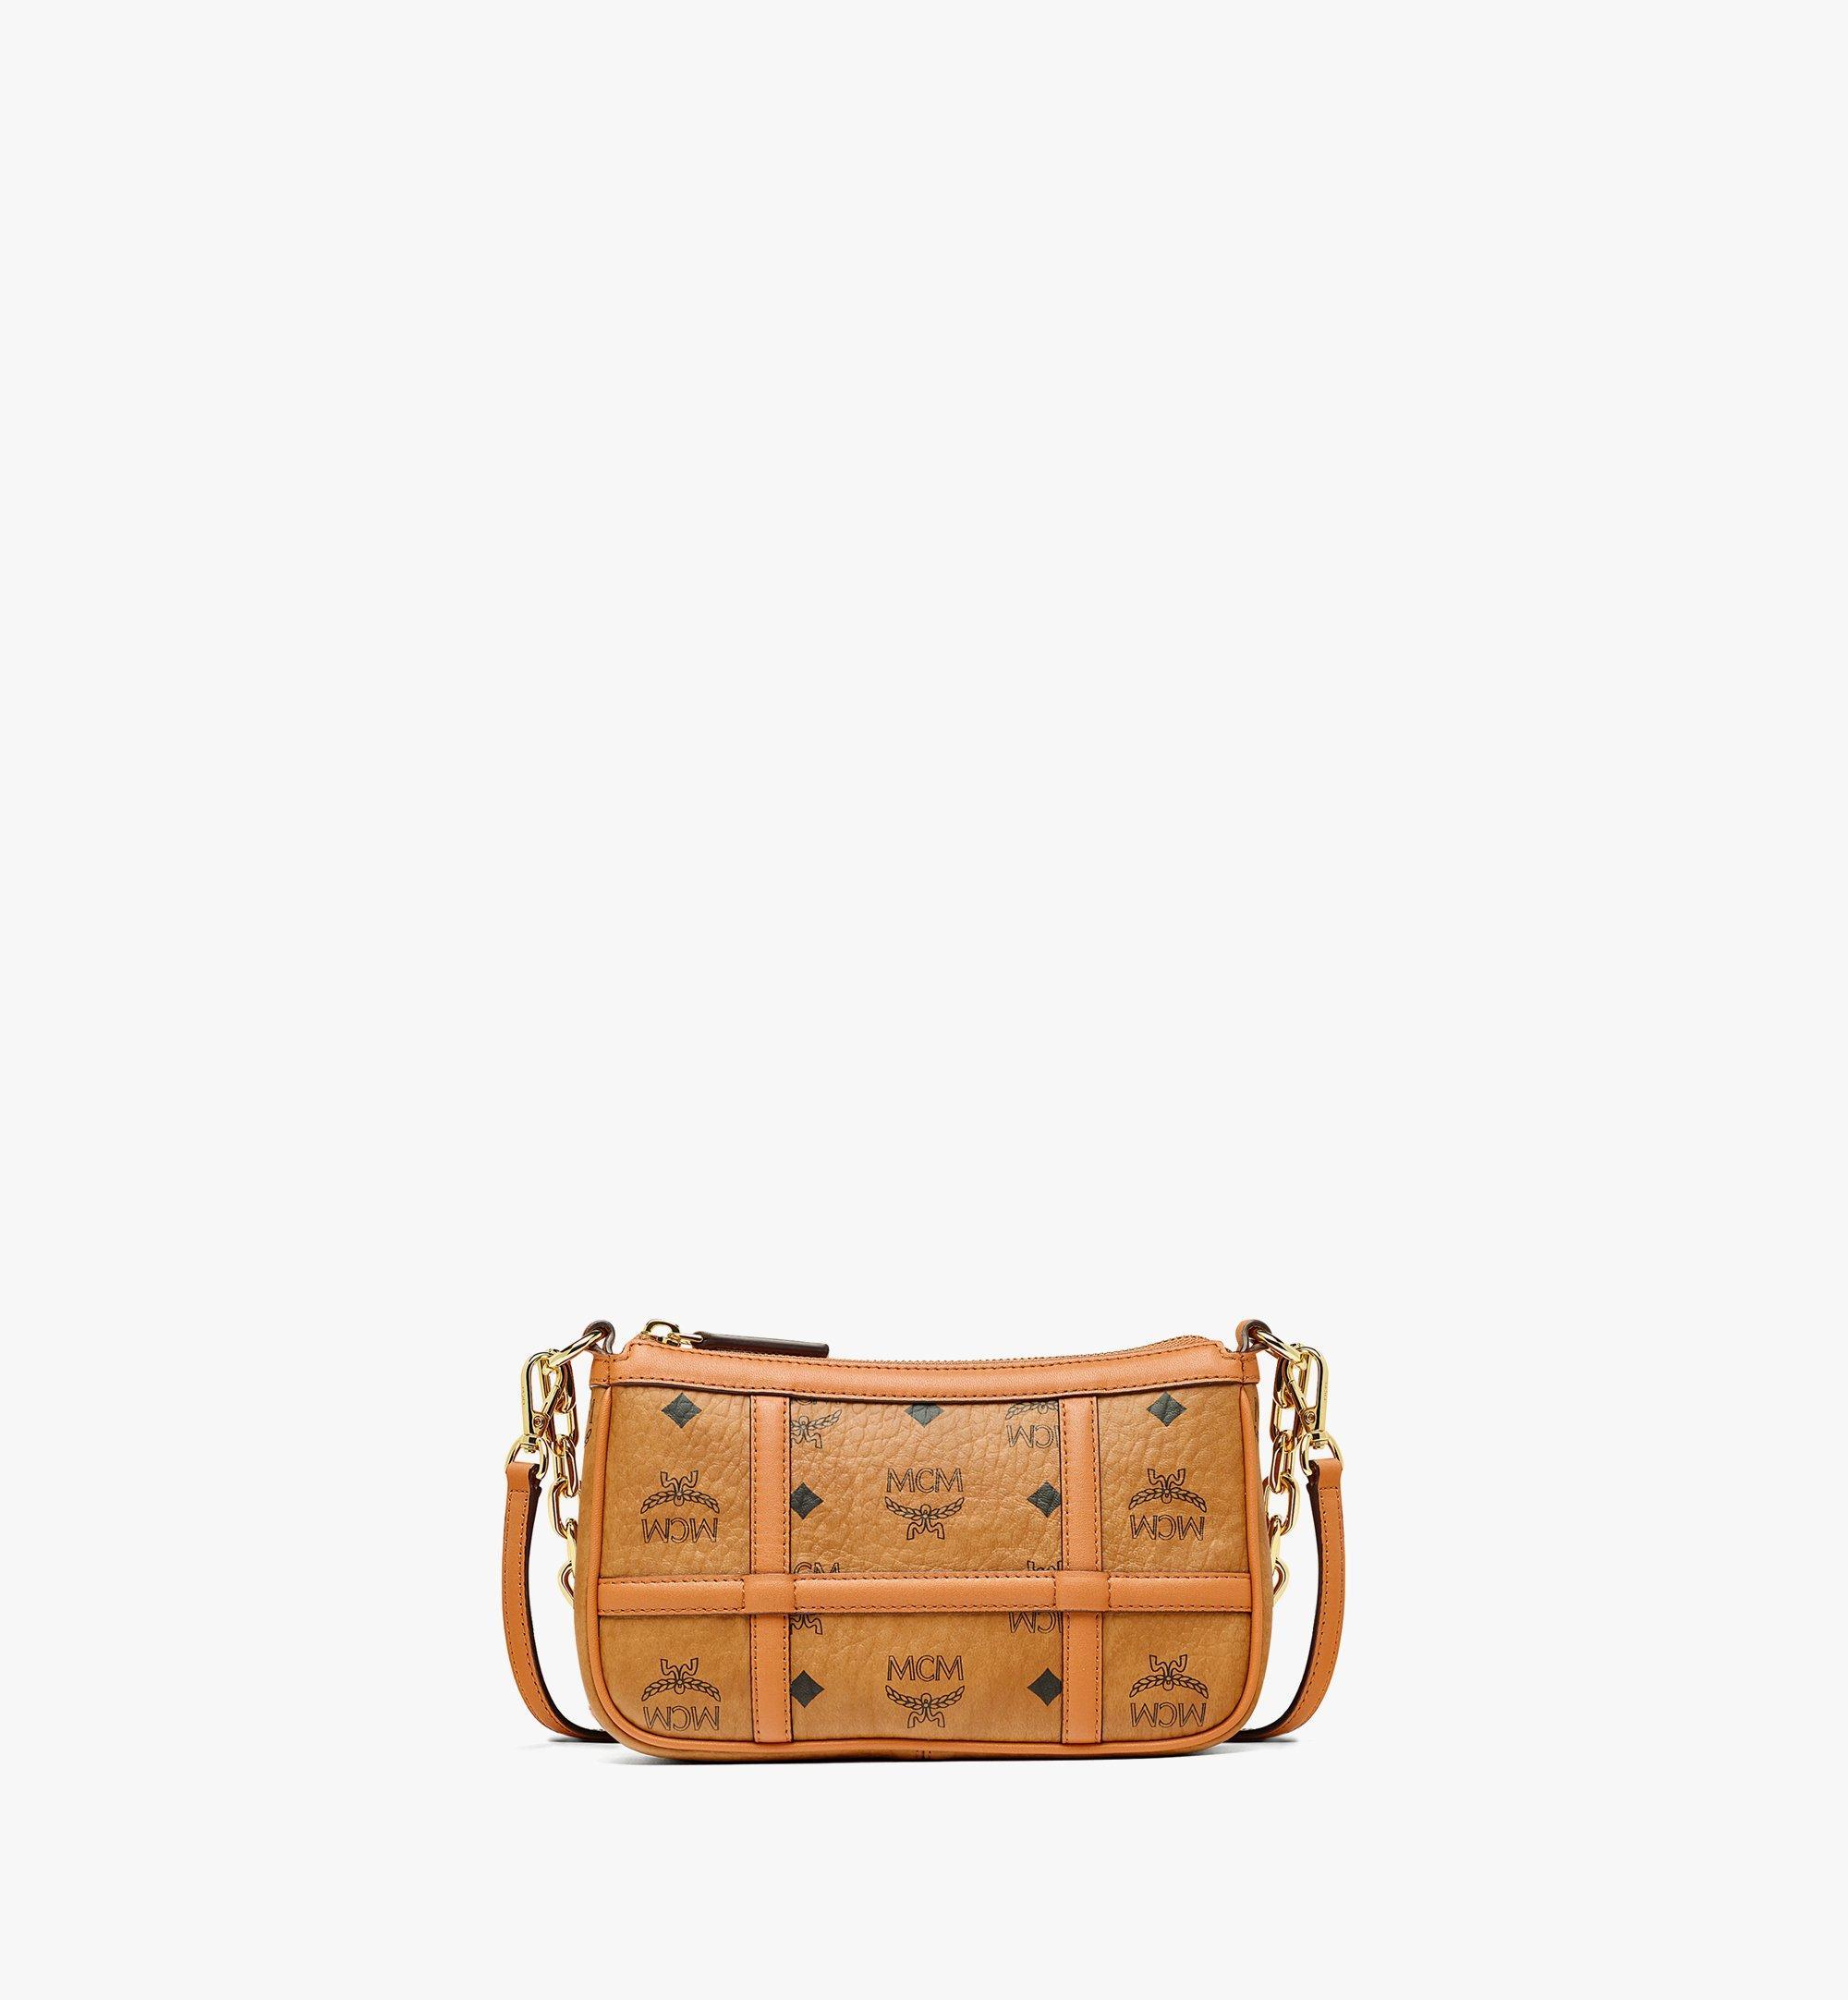 MCM Delmy Shoulder Bag in Visetos Cognac MWSBAER01CO001 Alternate View 3